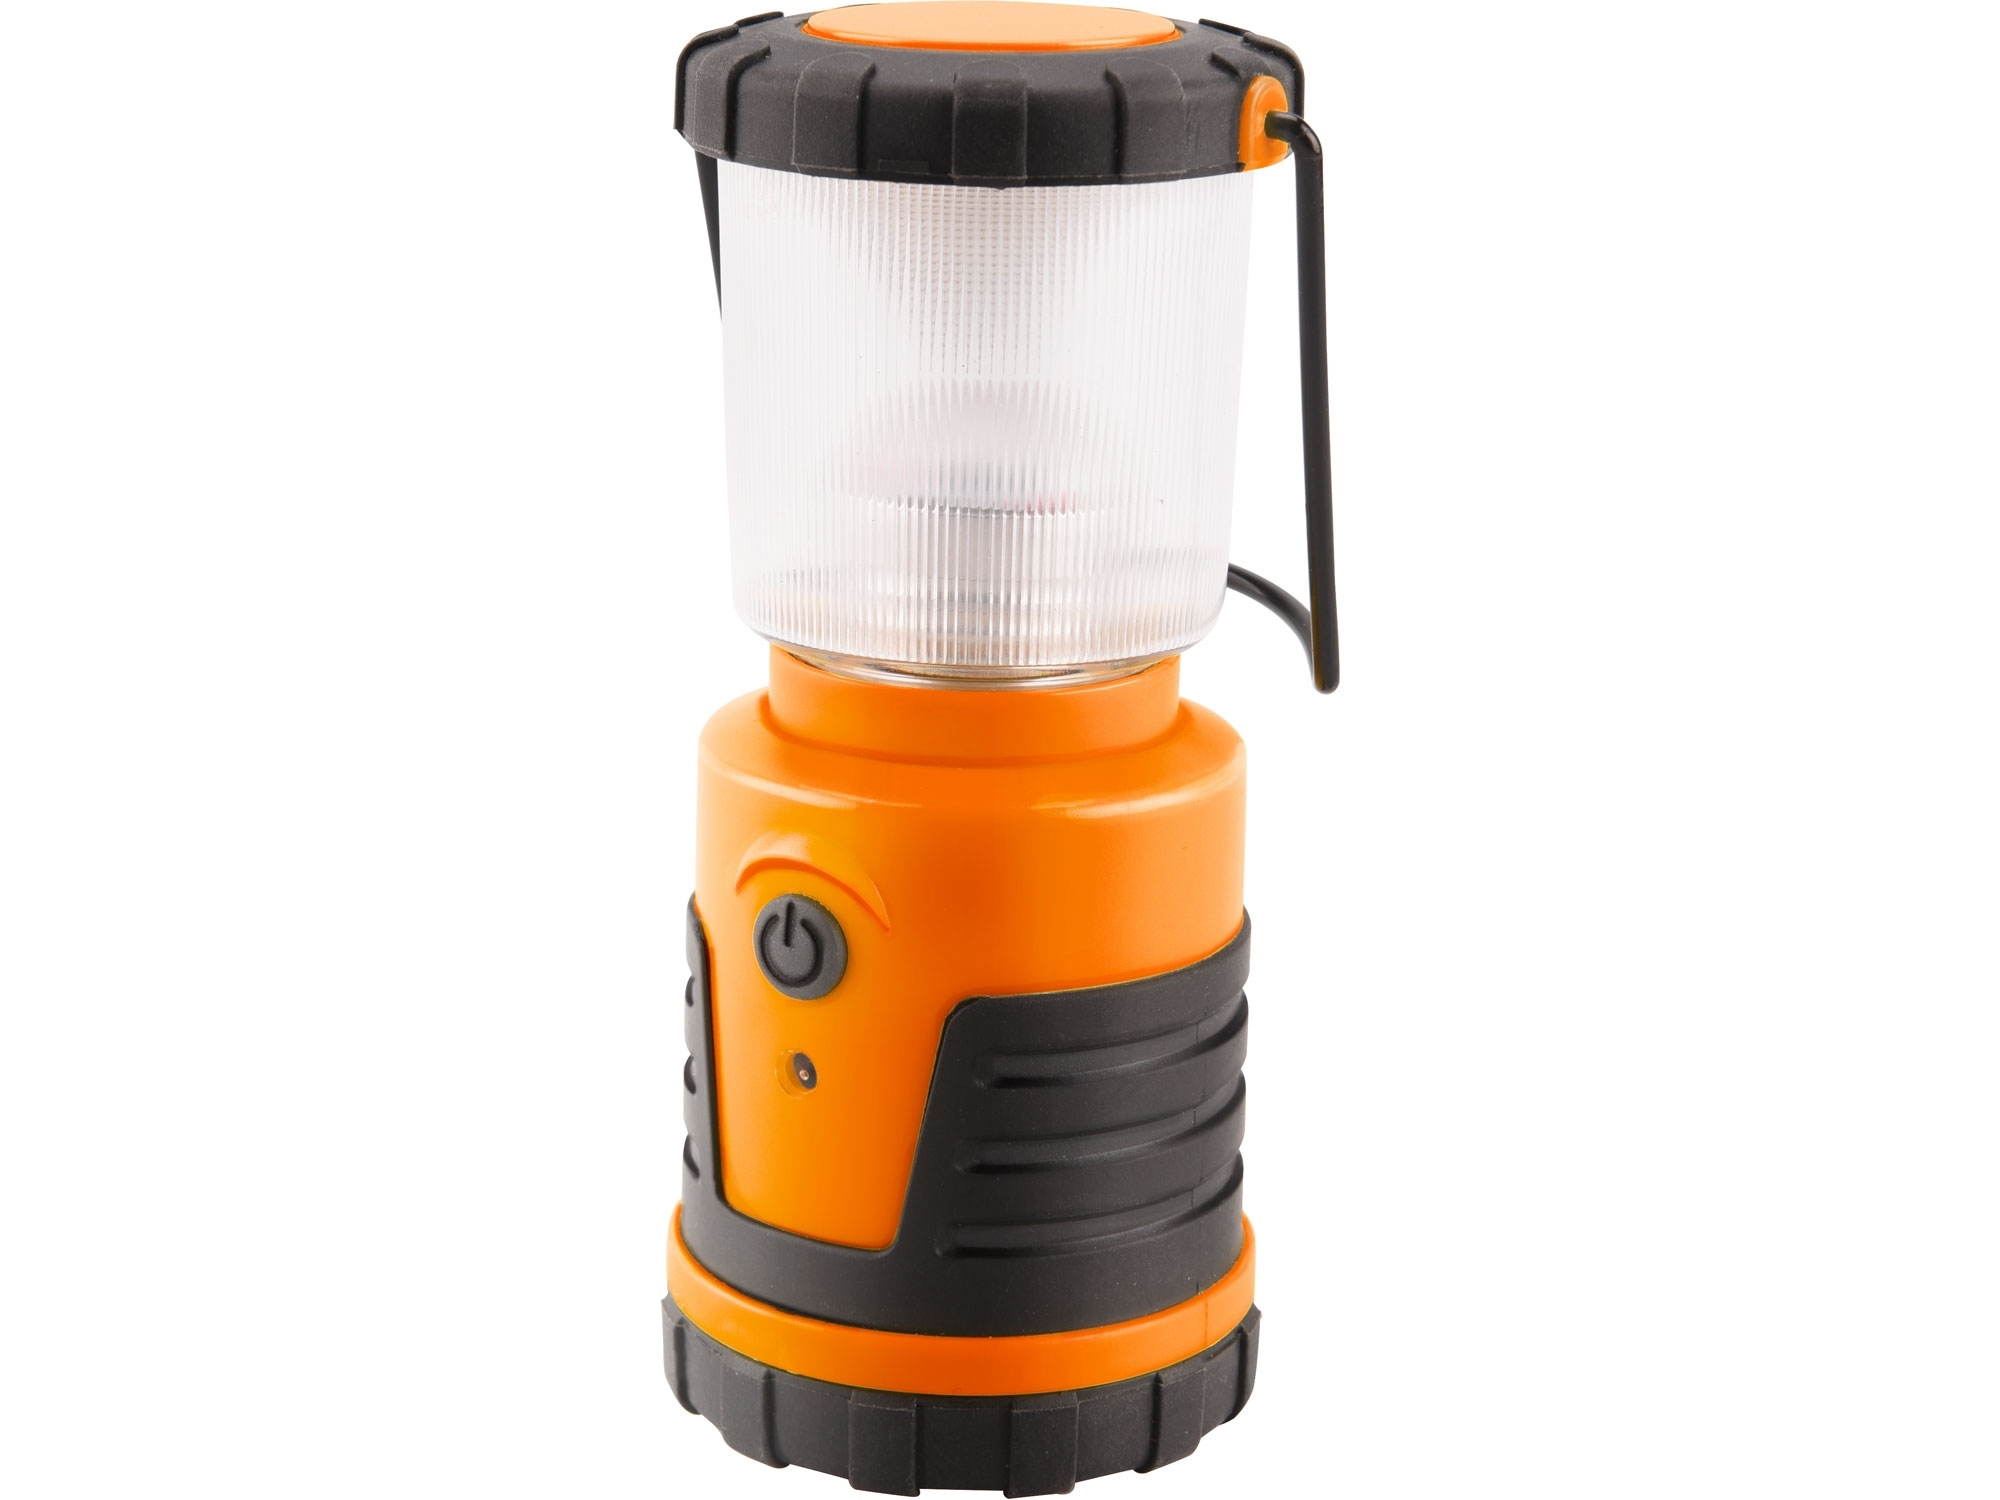 lucerna turistická 150lm, 3W CREE XPE LED, EXTOL LIGHT 43114